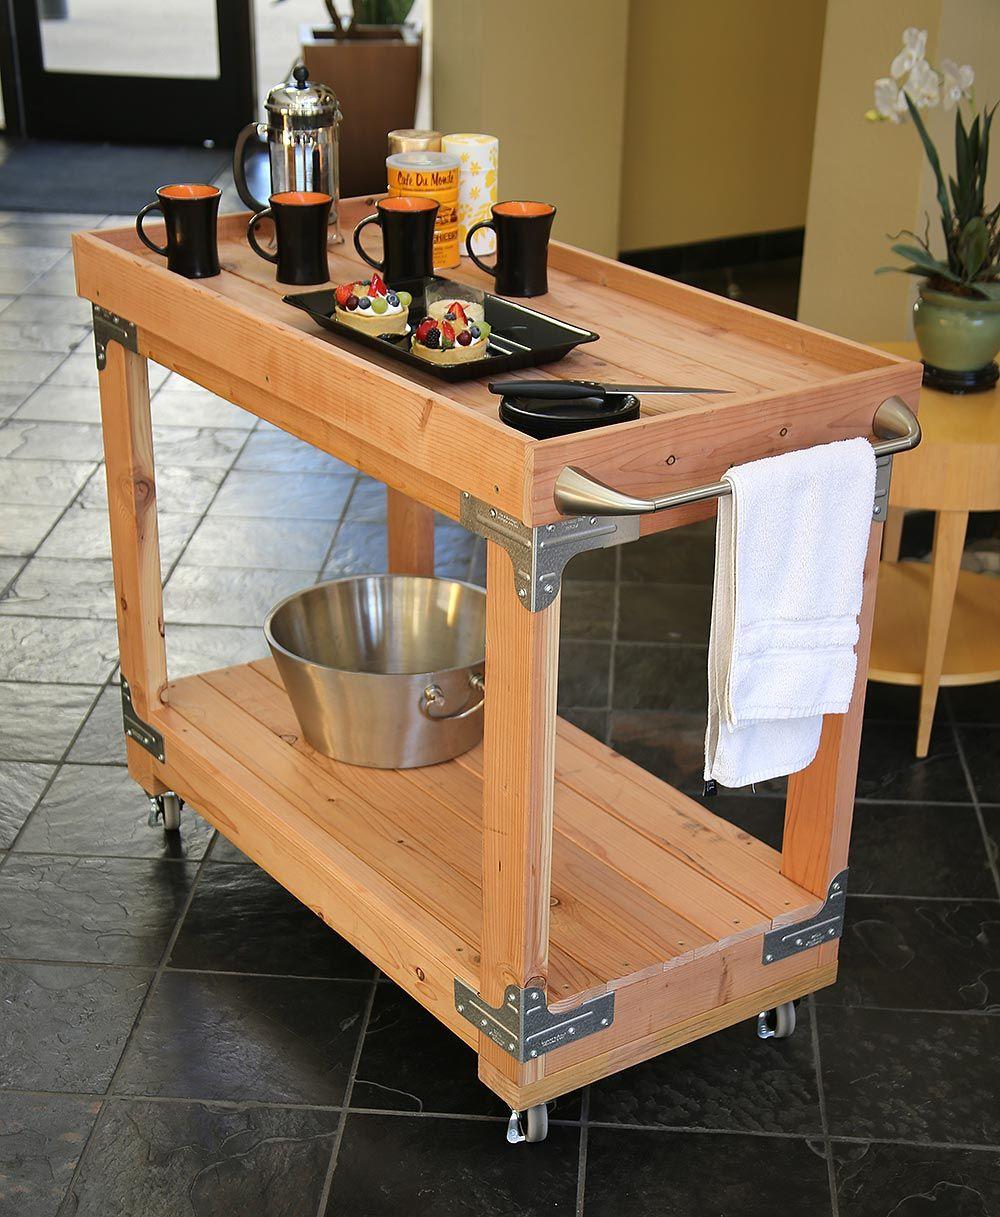 Diy trend bar carts diy done right wooden bar cart